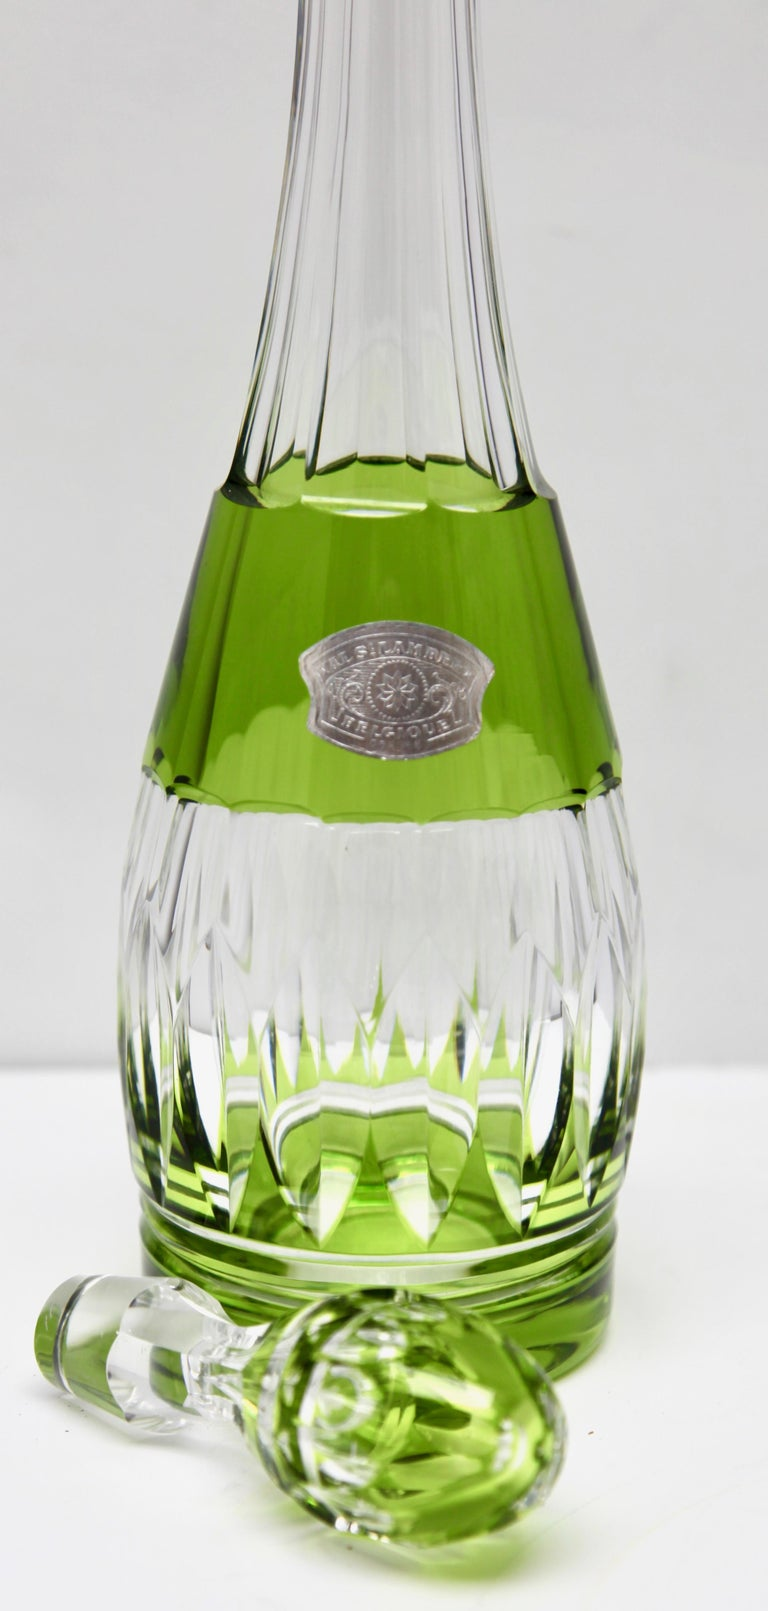 Val Saint Lambert Crystal Decanter, 6 Crystal Wine Goblets Handcut, 1950s For Sale 12